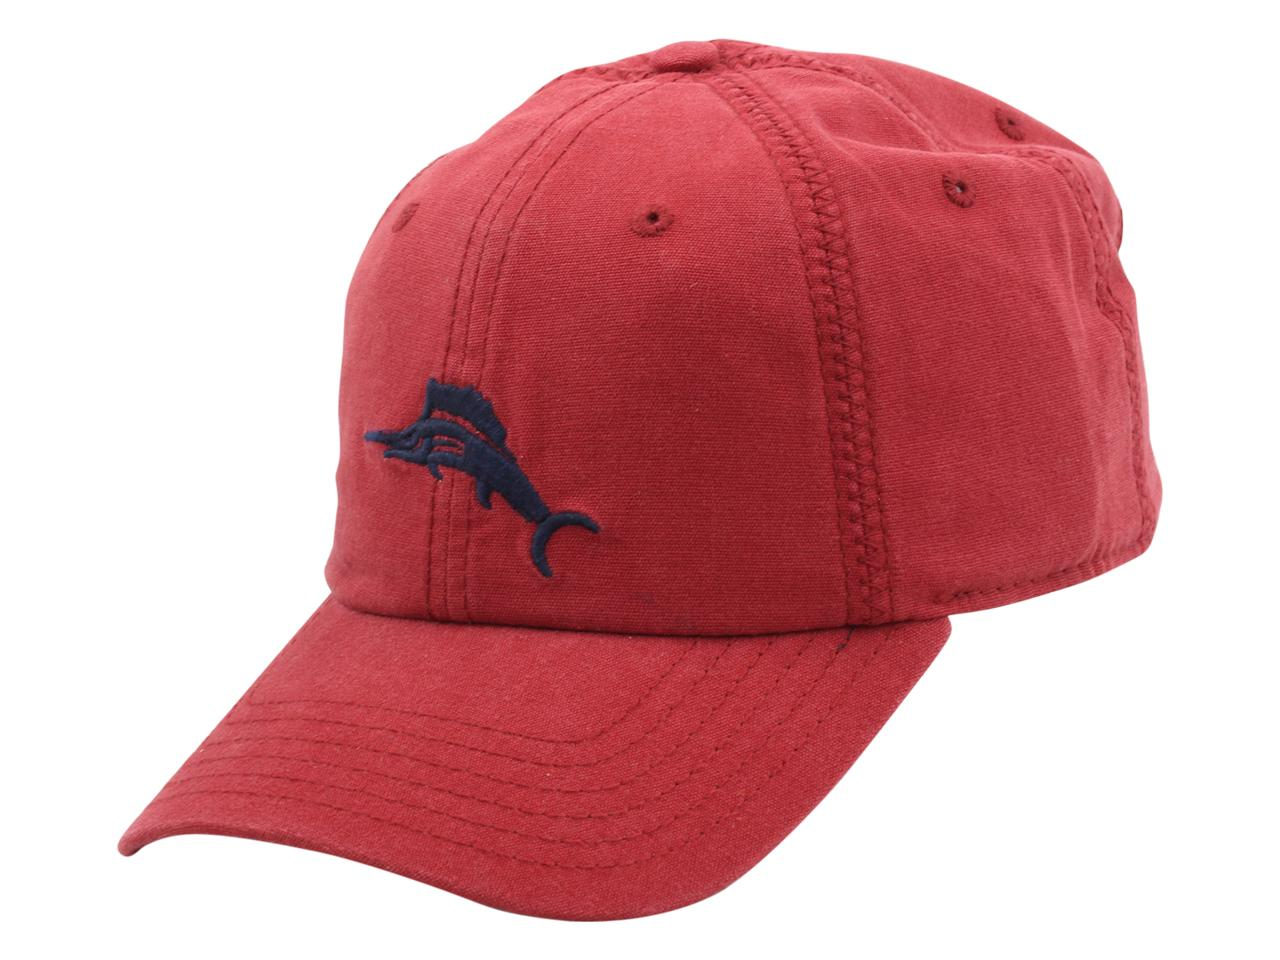 Image of Tommy Bahama Men's Strapback Cross Stitch Baseball Cap Hat - Brick - One Size Fits Most